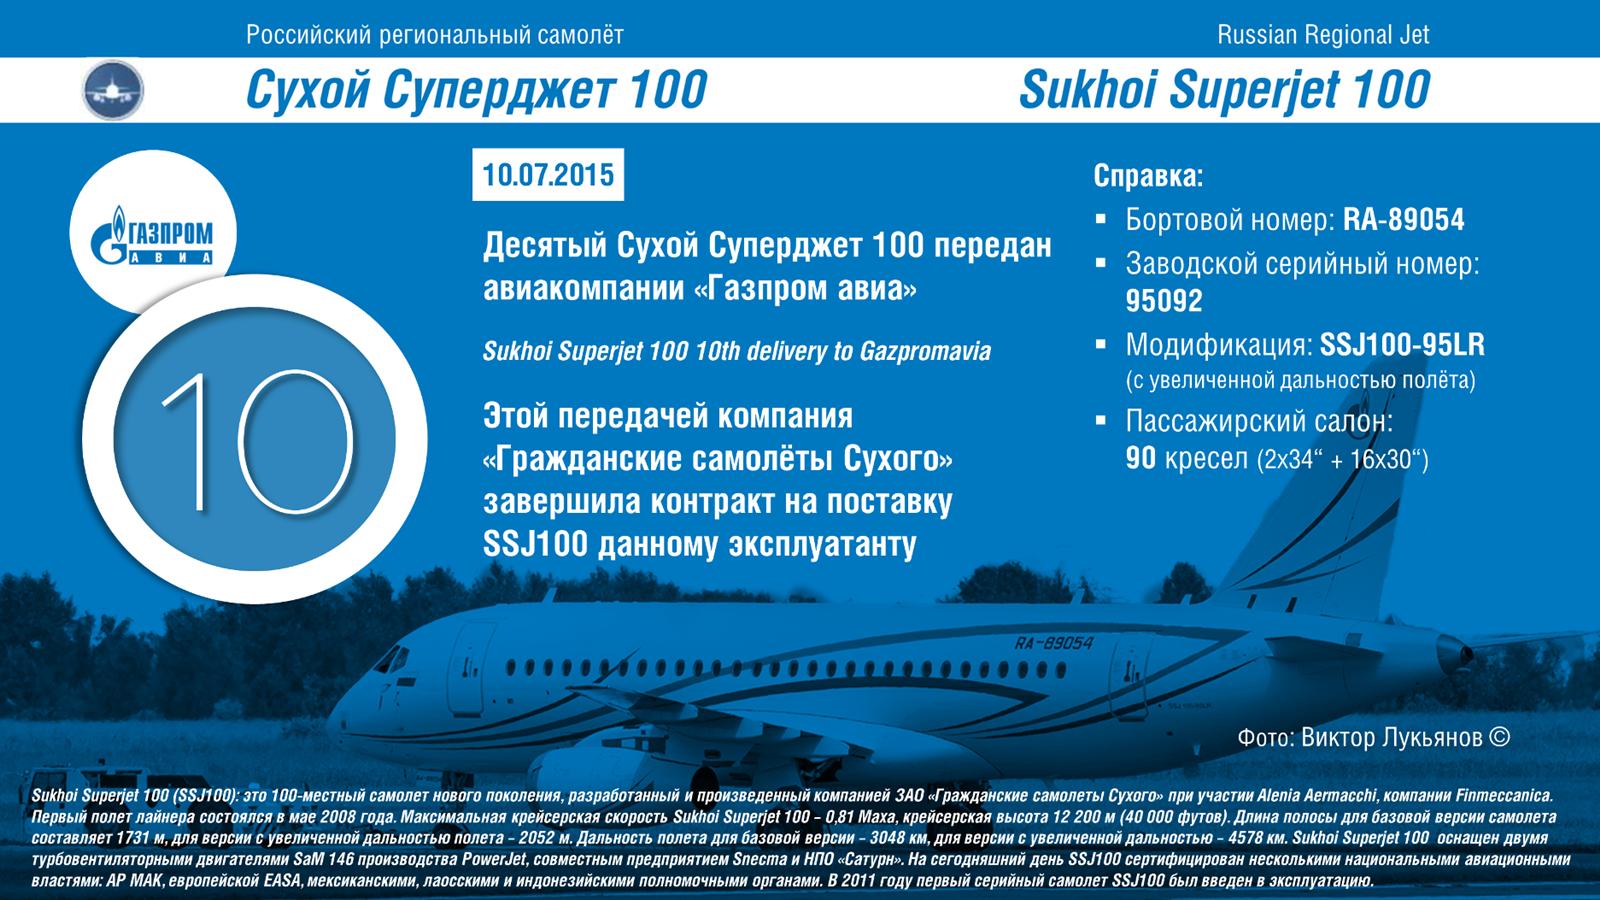 Sukhoi%20Superjet%20SSJ100%2010th%20Gazpromavia.png